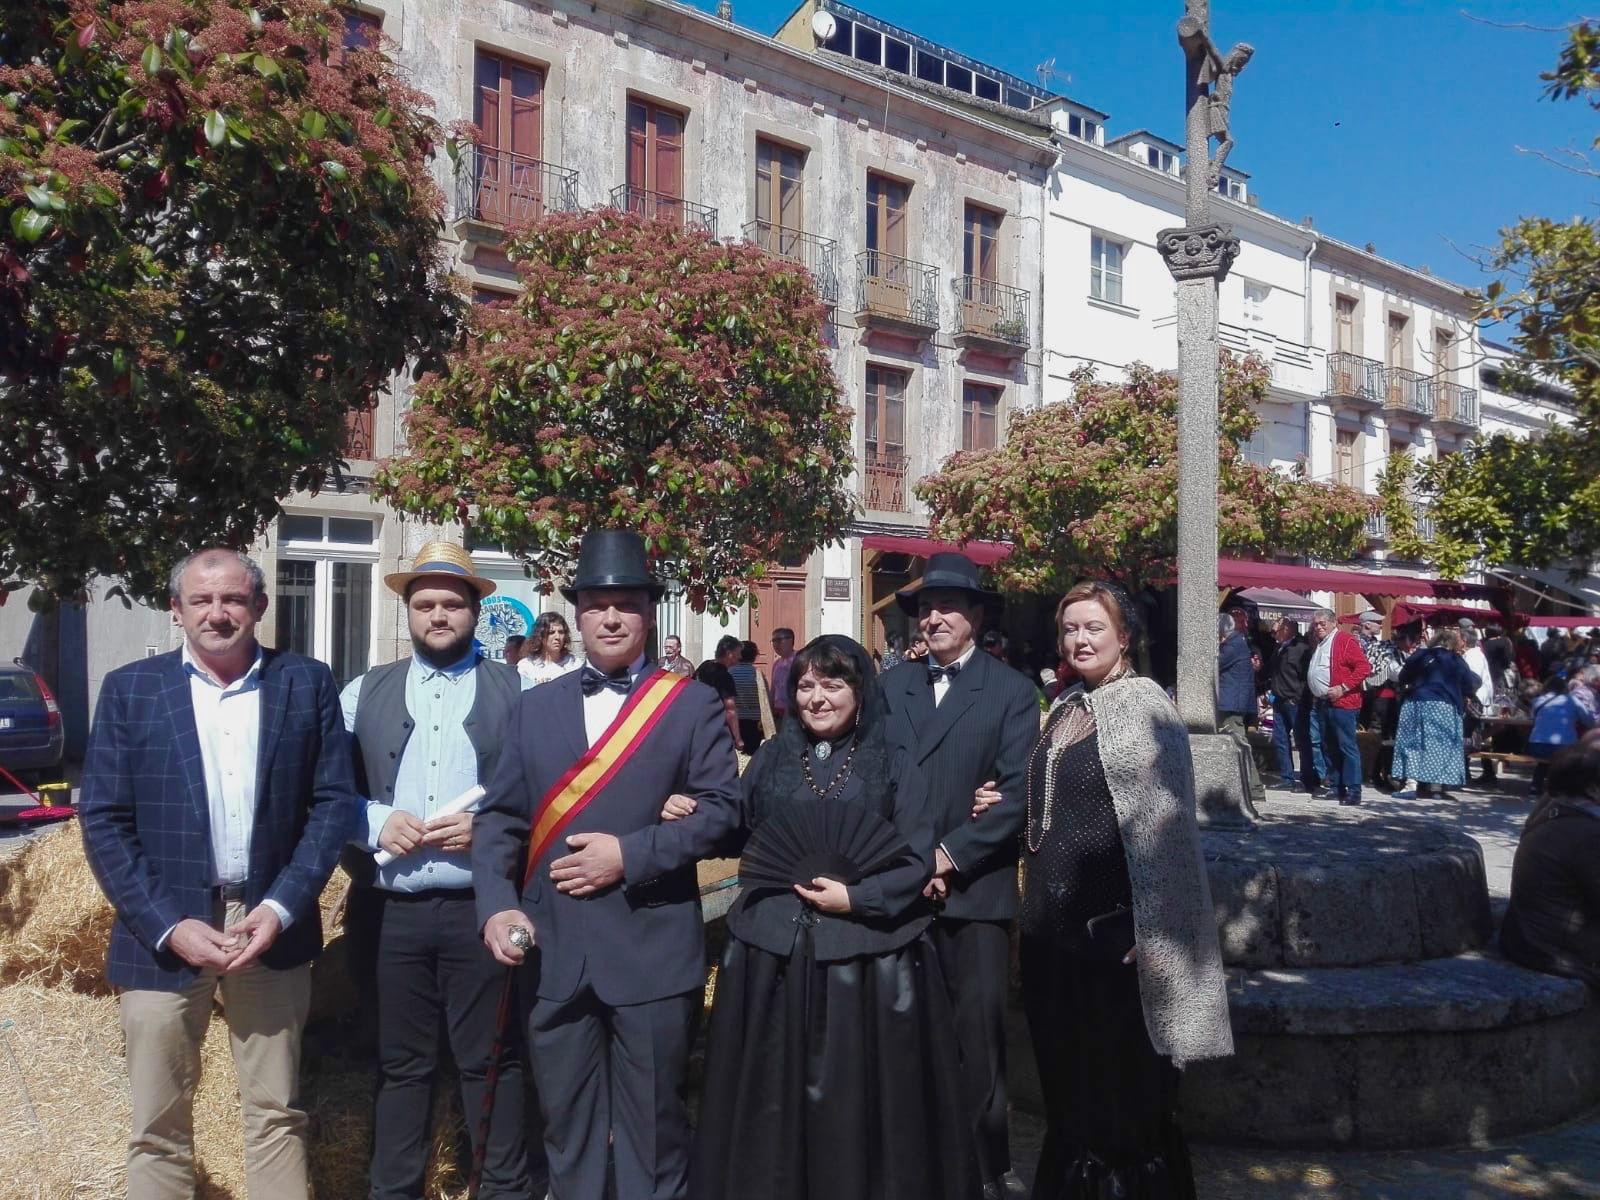 XIII Mercado Tradicional de Primavera do Valadouro